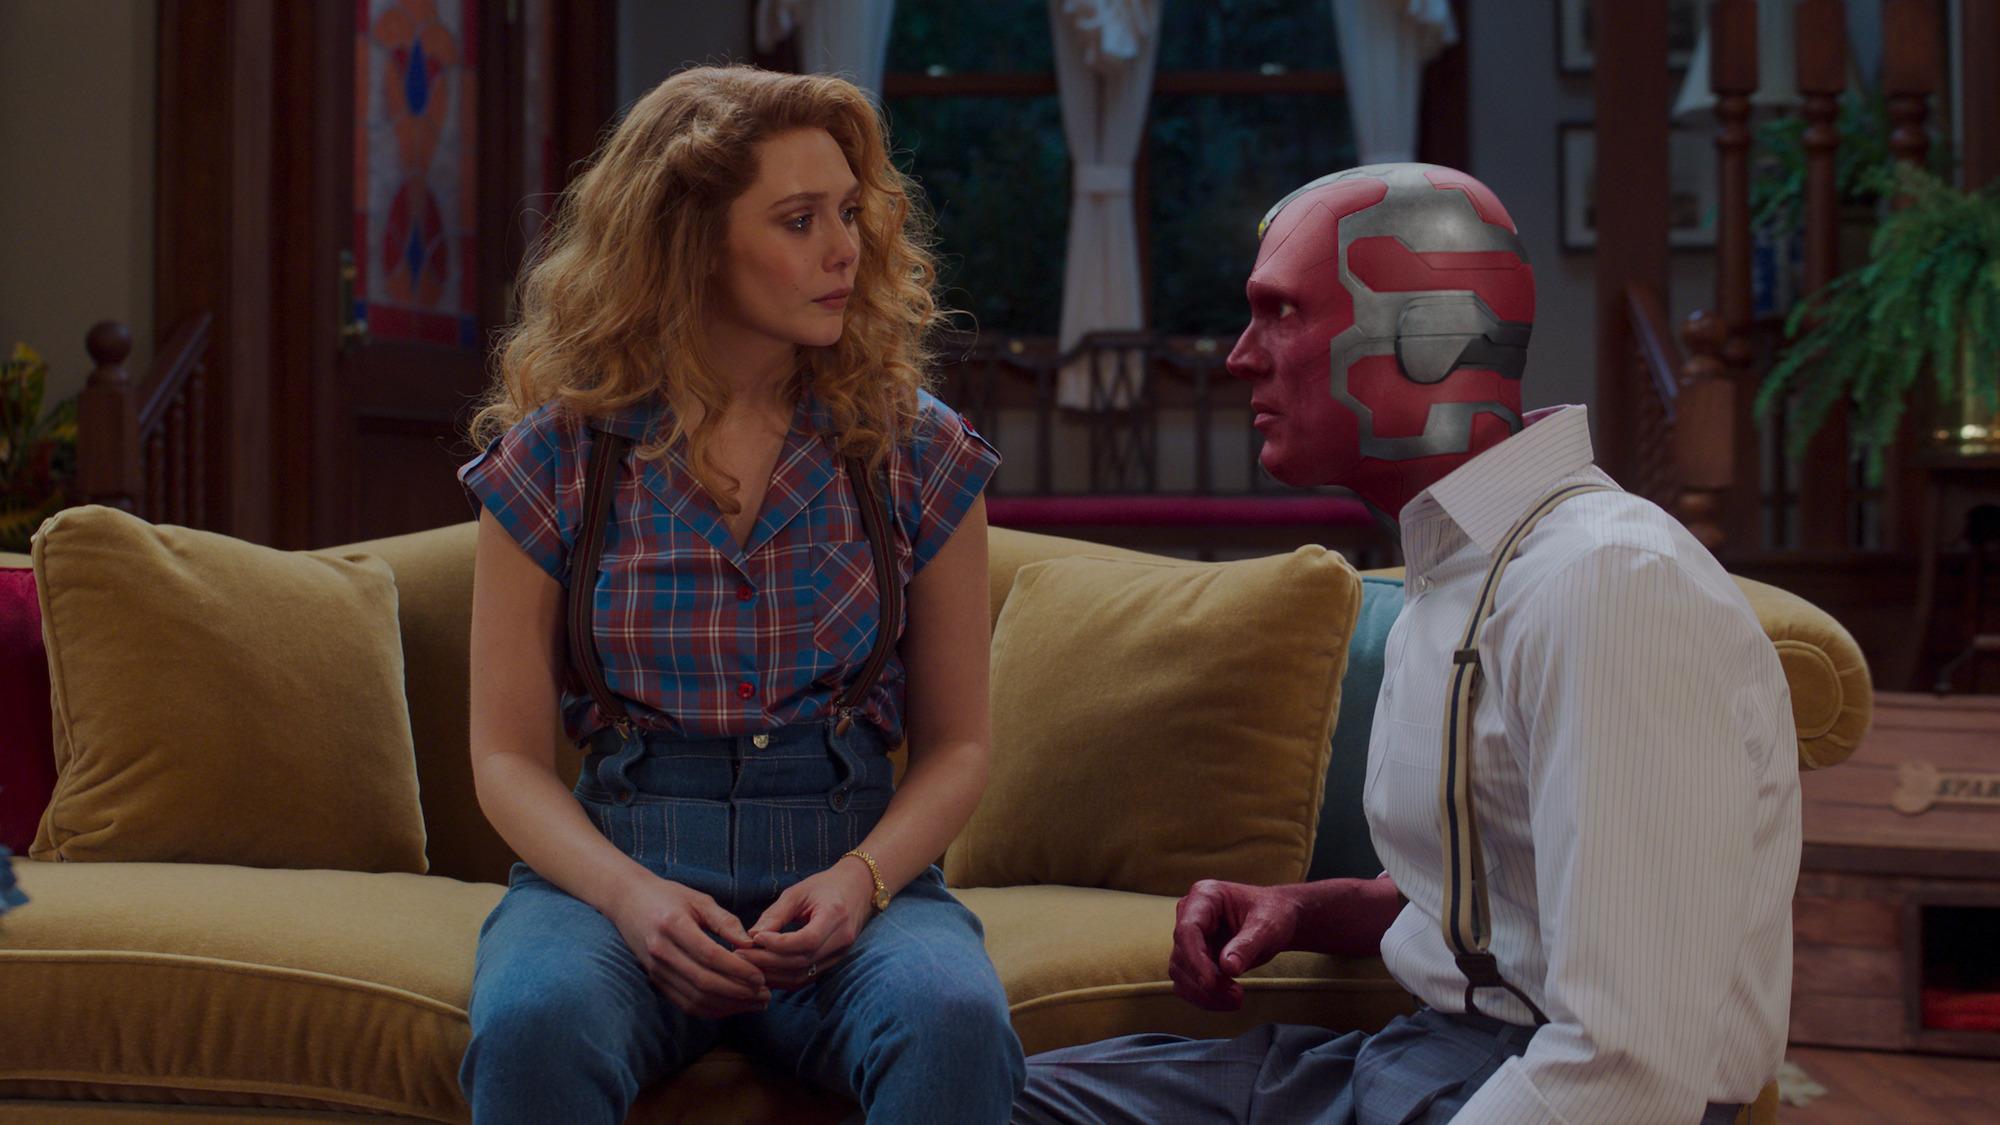 Elizabeth Olsen as Wanda Maximoff and Paul Bettany as Vision in 'WandaVision.'